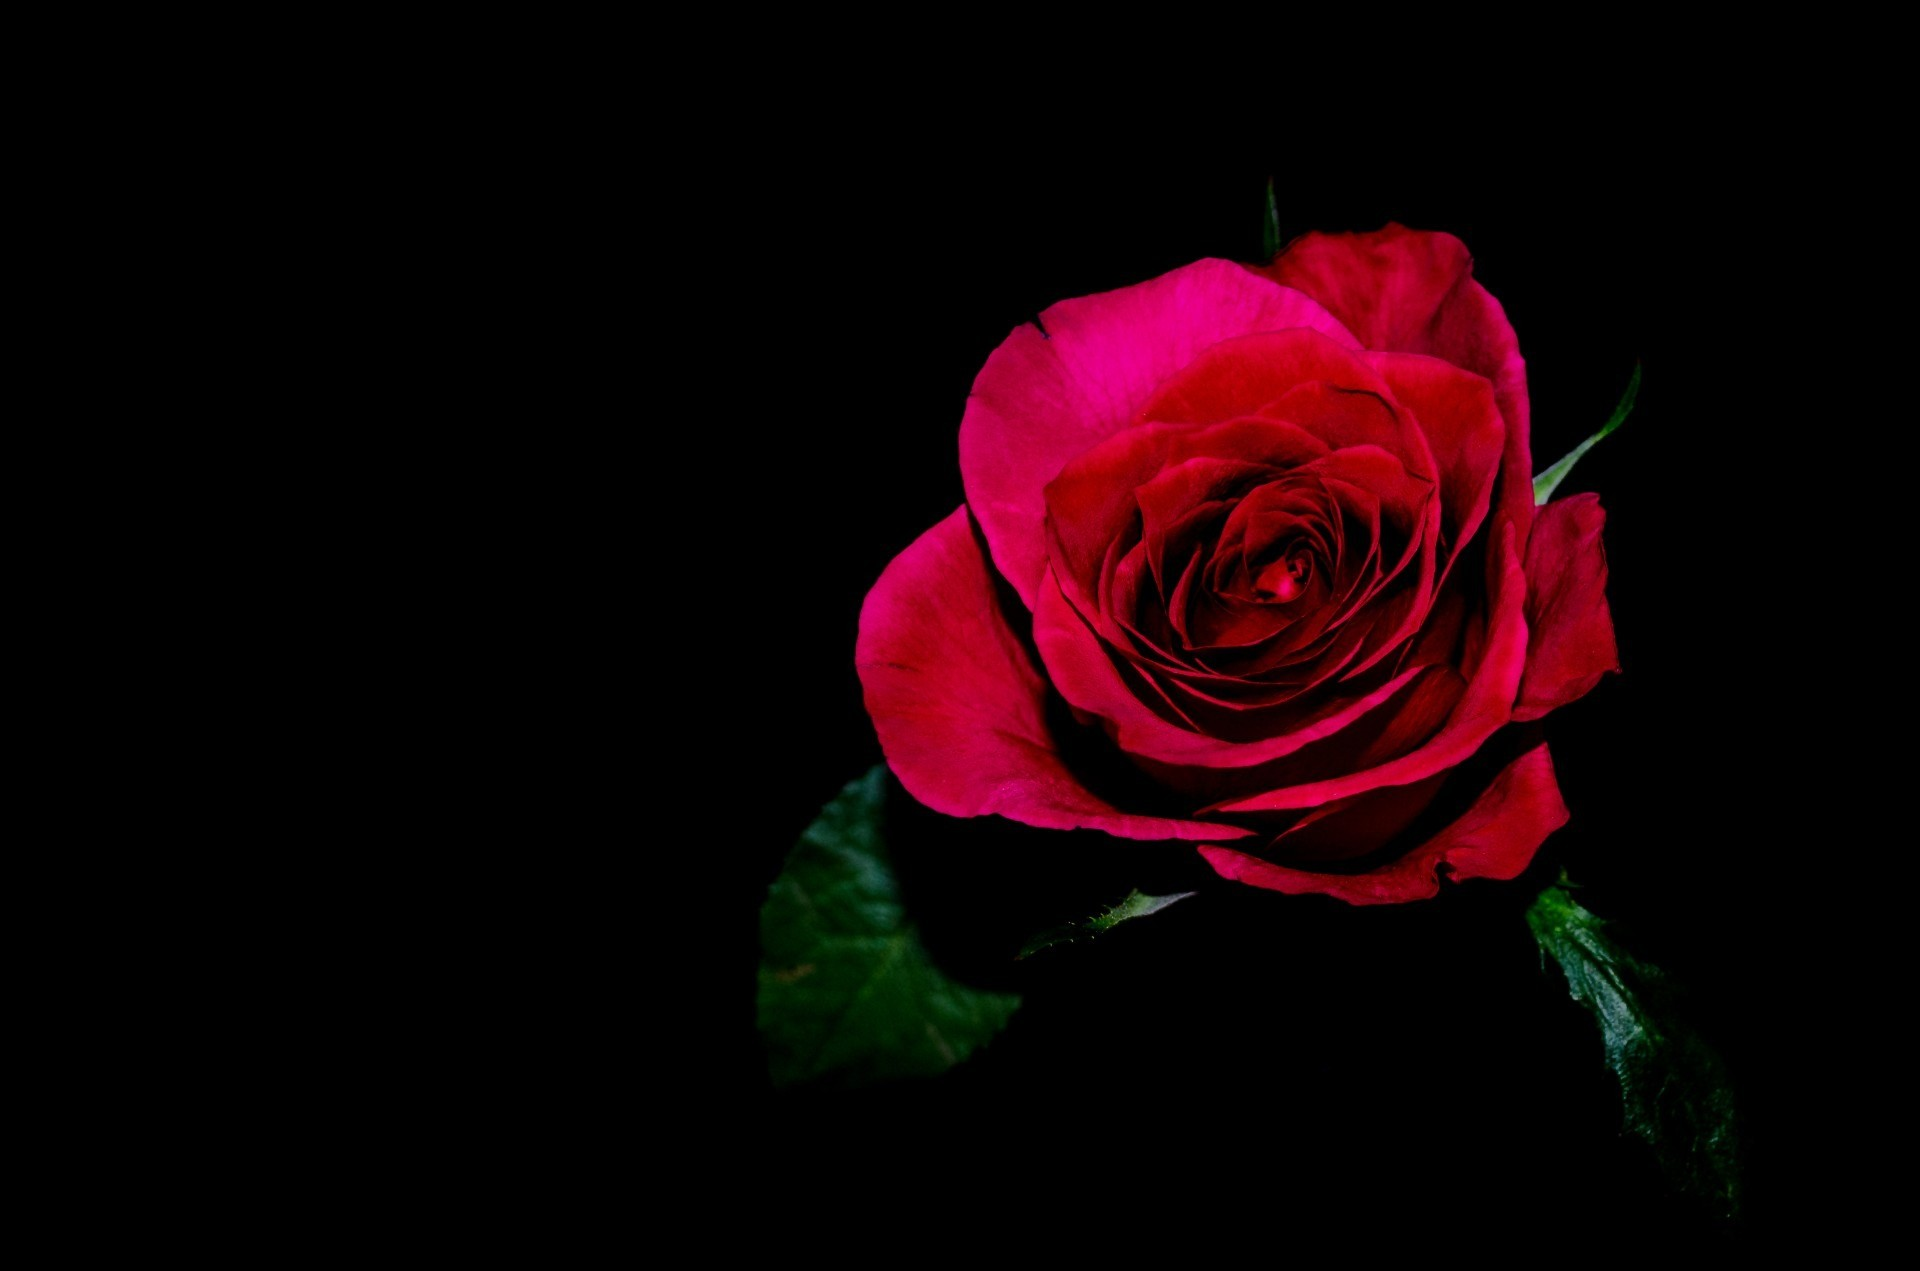 Red Rose On Black Background ·①